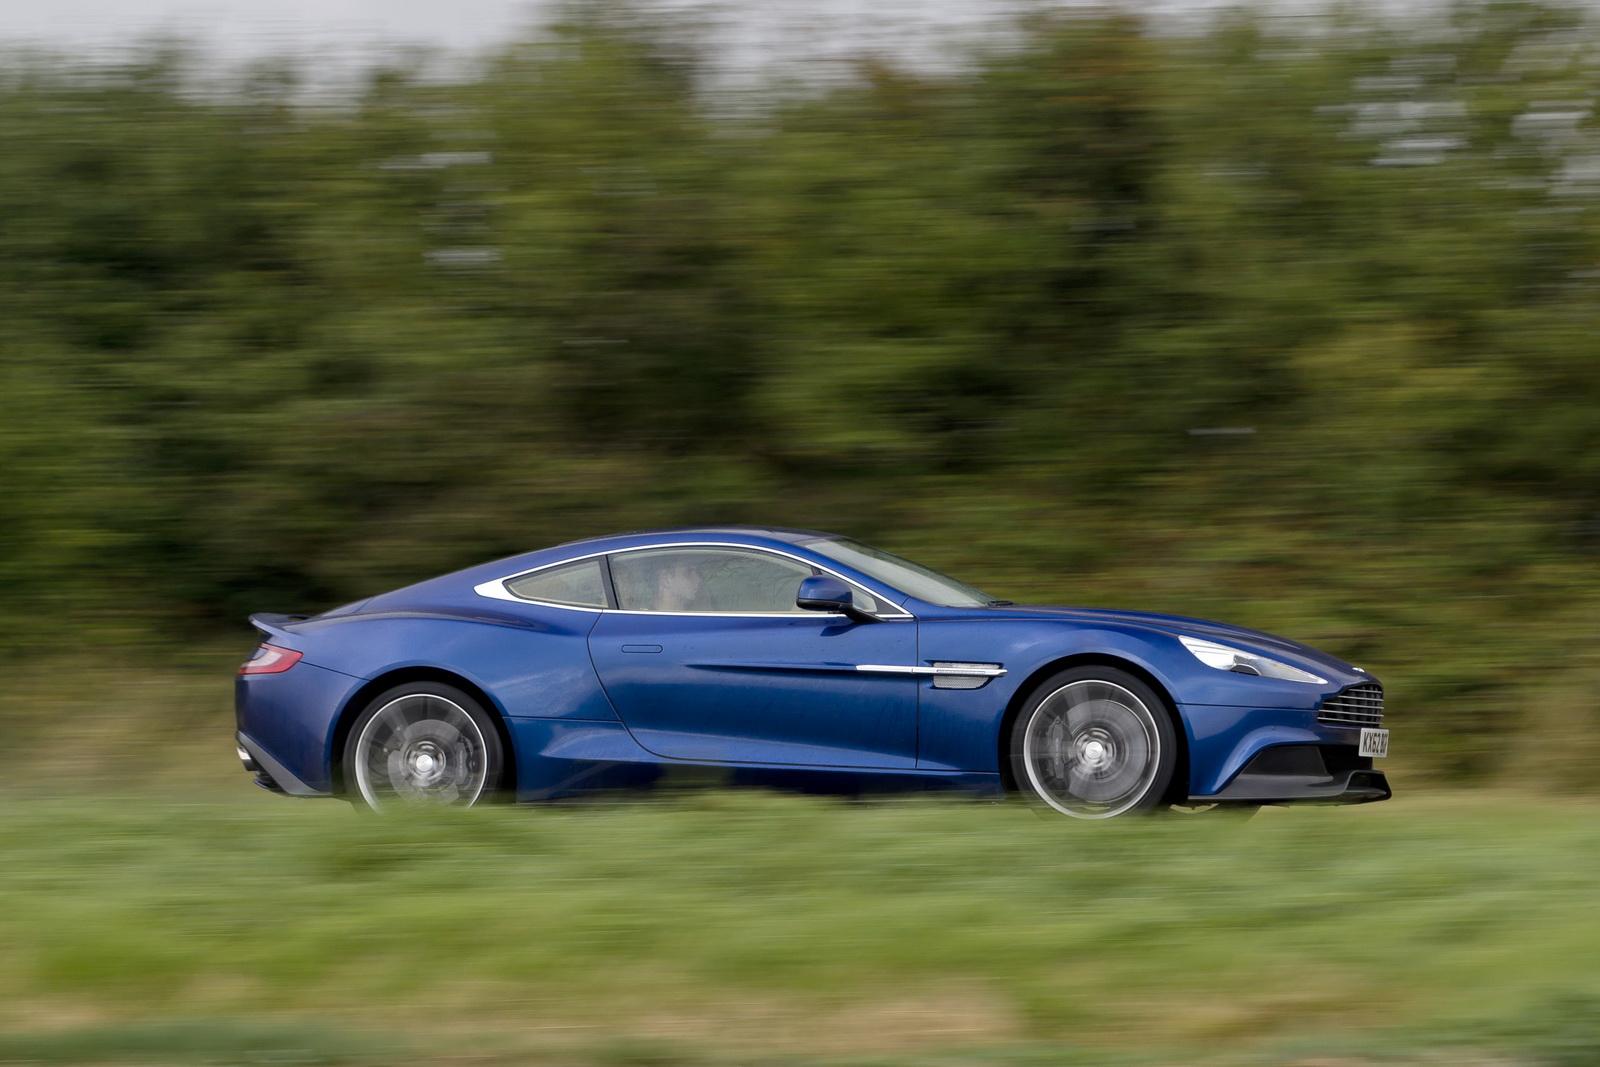 Borla Hadirkan Exhaust System Bolt On Khusus Untuk Aston Martin